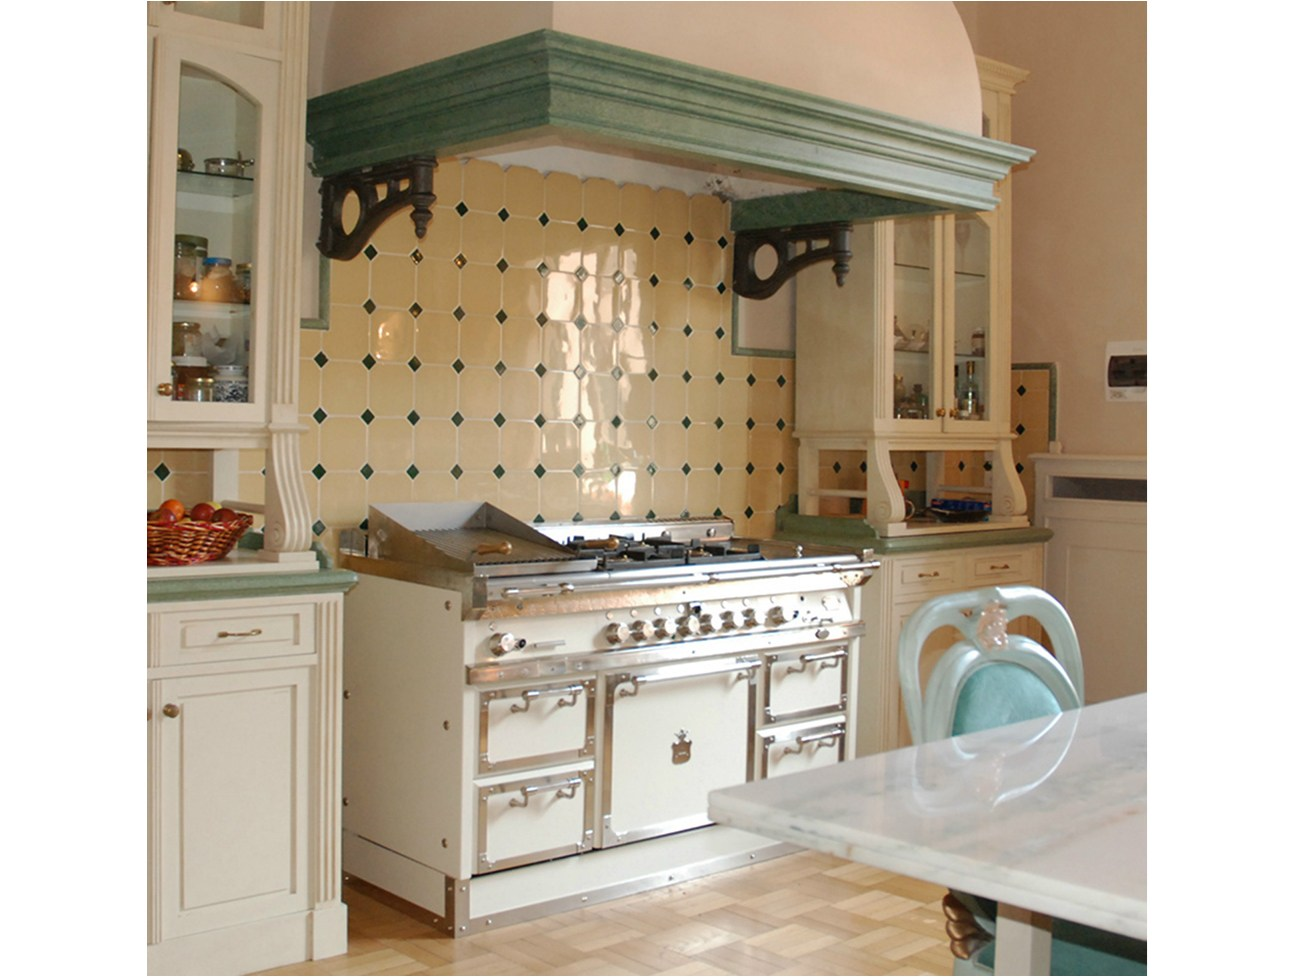 Og148 cucina a libera installazione by officine gullo - Officine gullo cucine prezzi ...